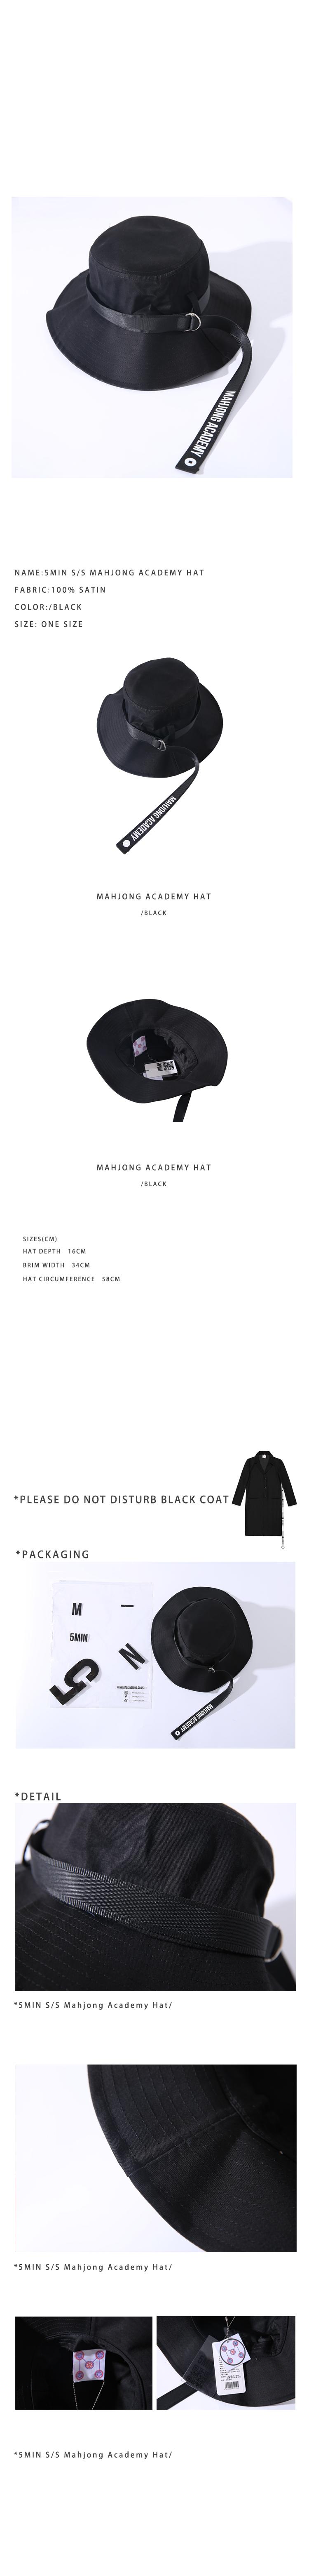 MA2805B-english.jpg